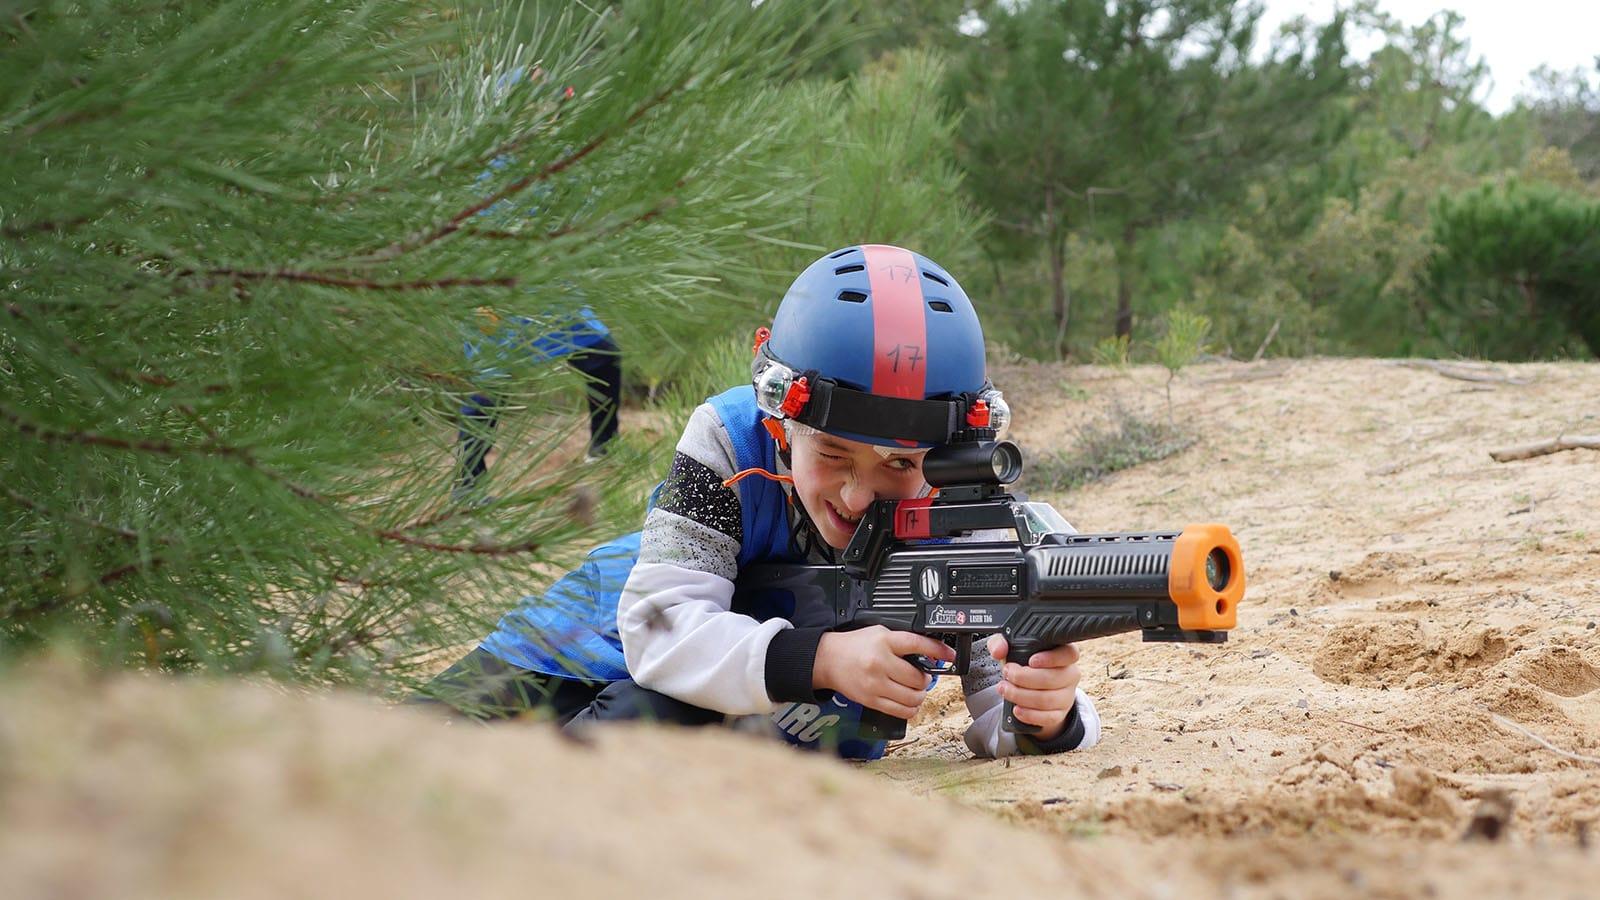 Activités sports nature, laser tag, michel arnaud